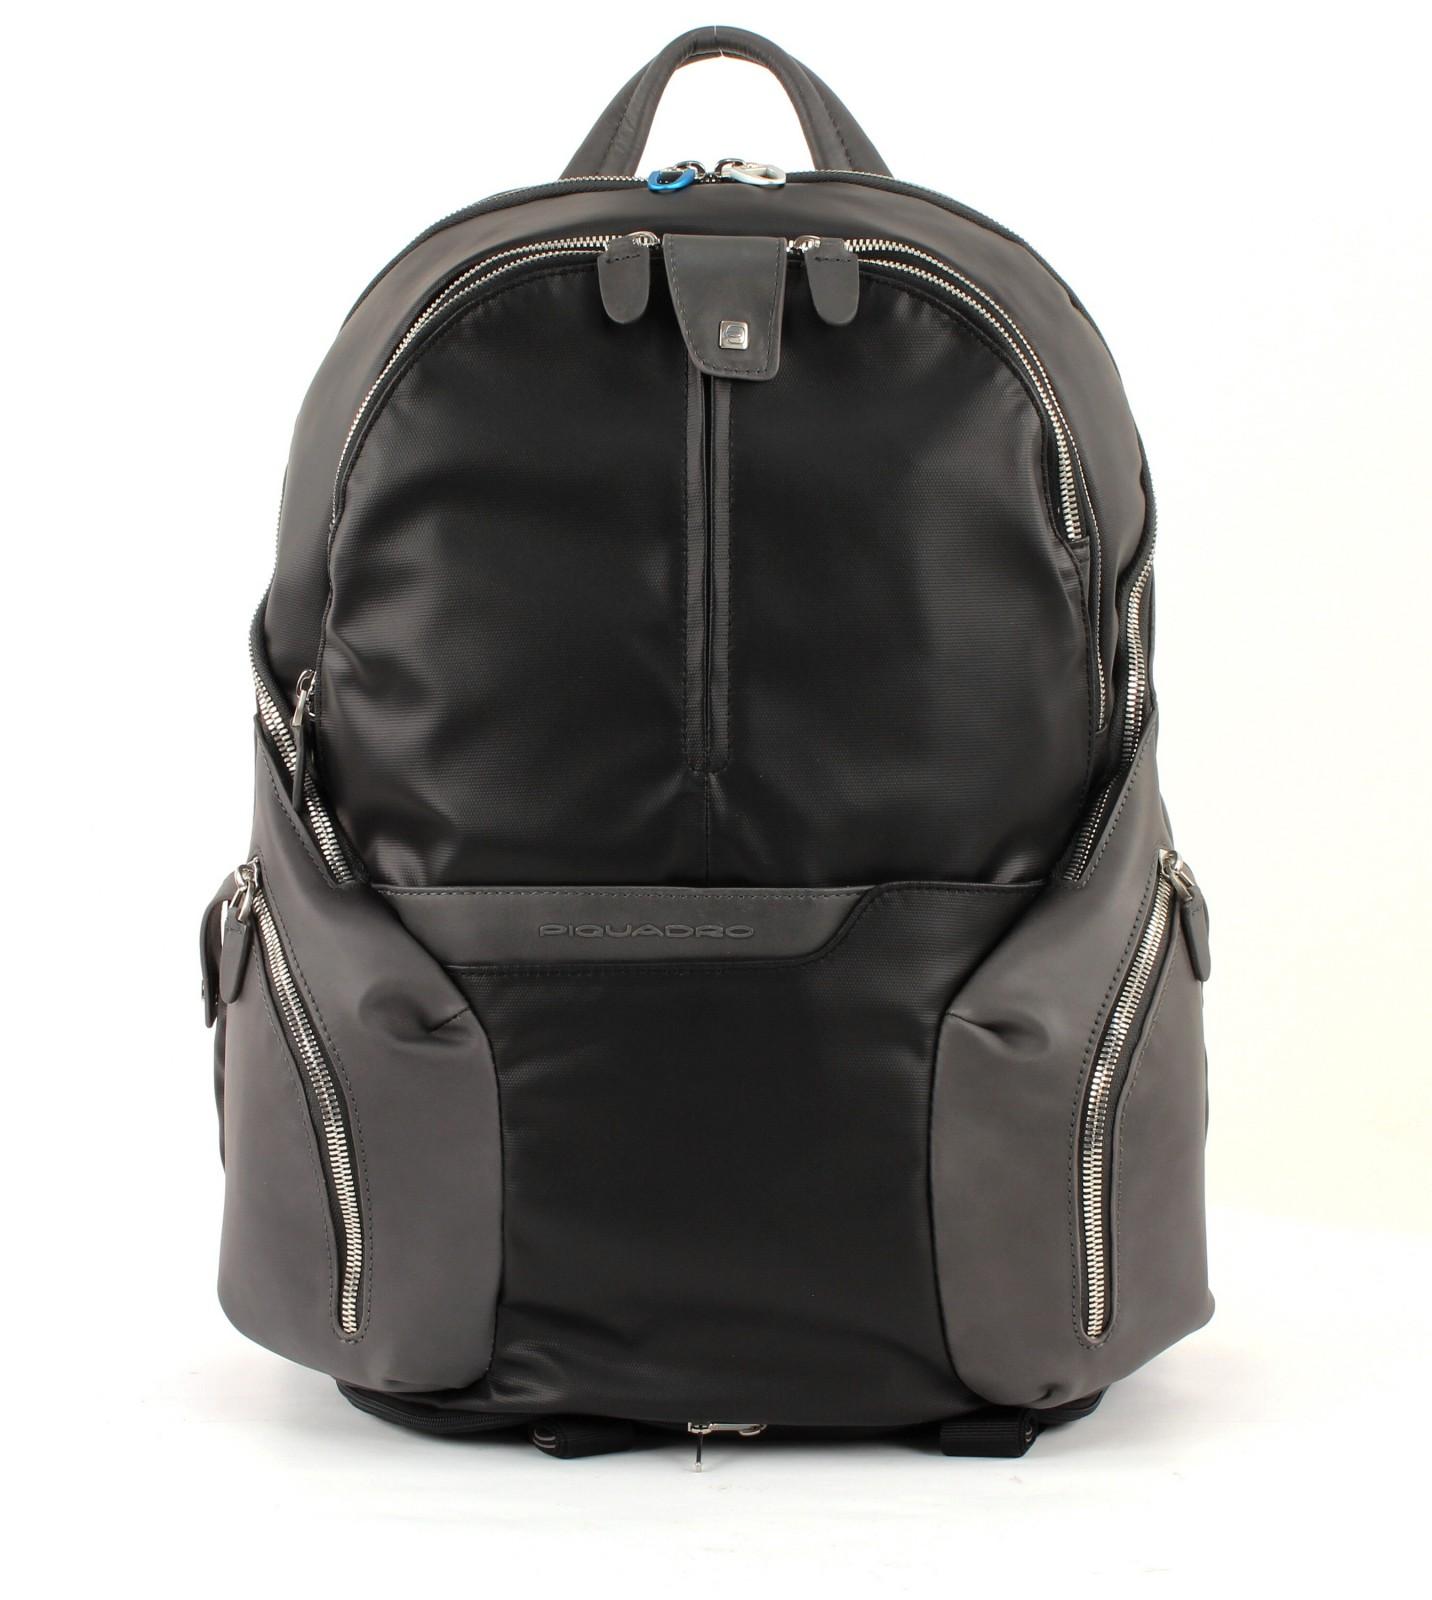 PIQUADRO Coleos Expandable Laptop Backpack Nero